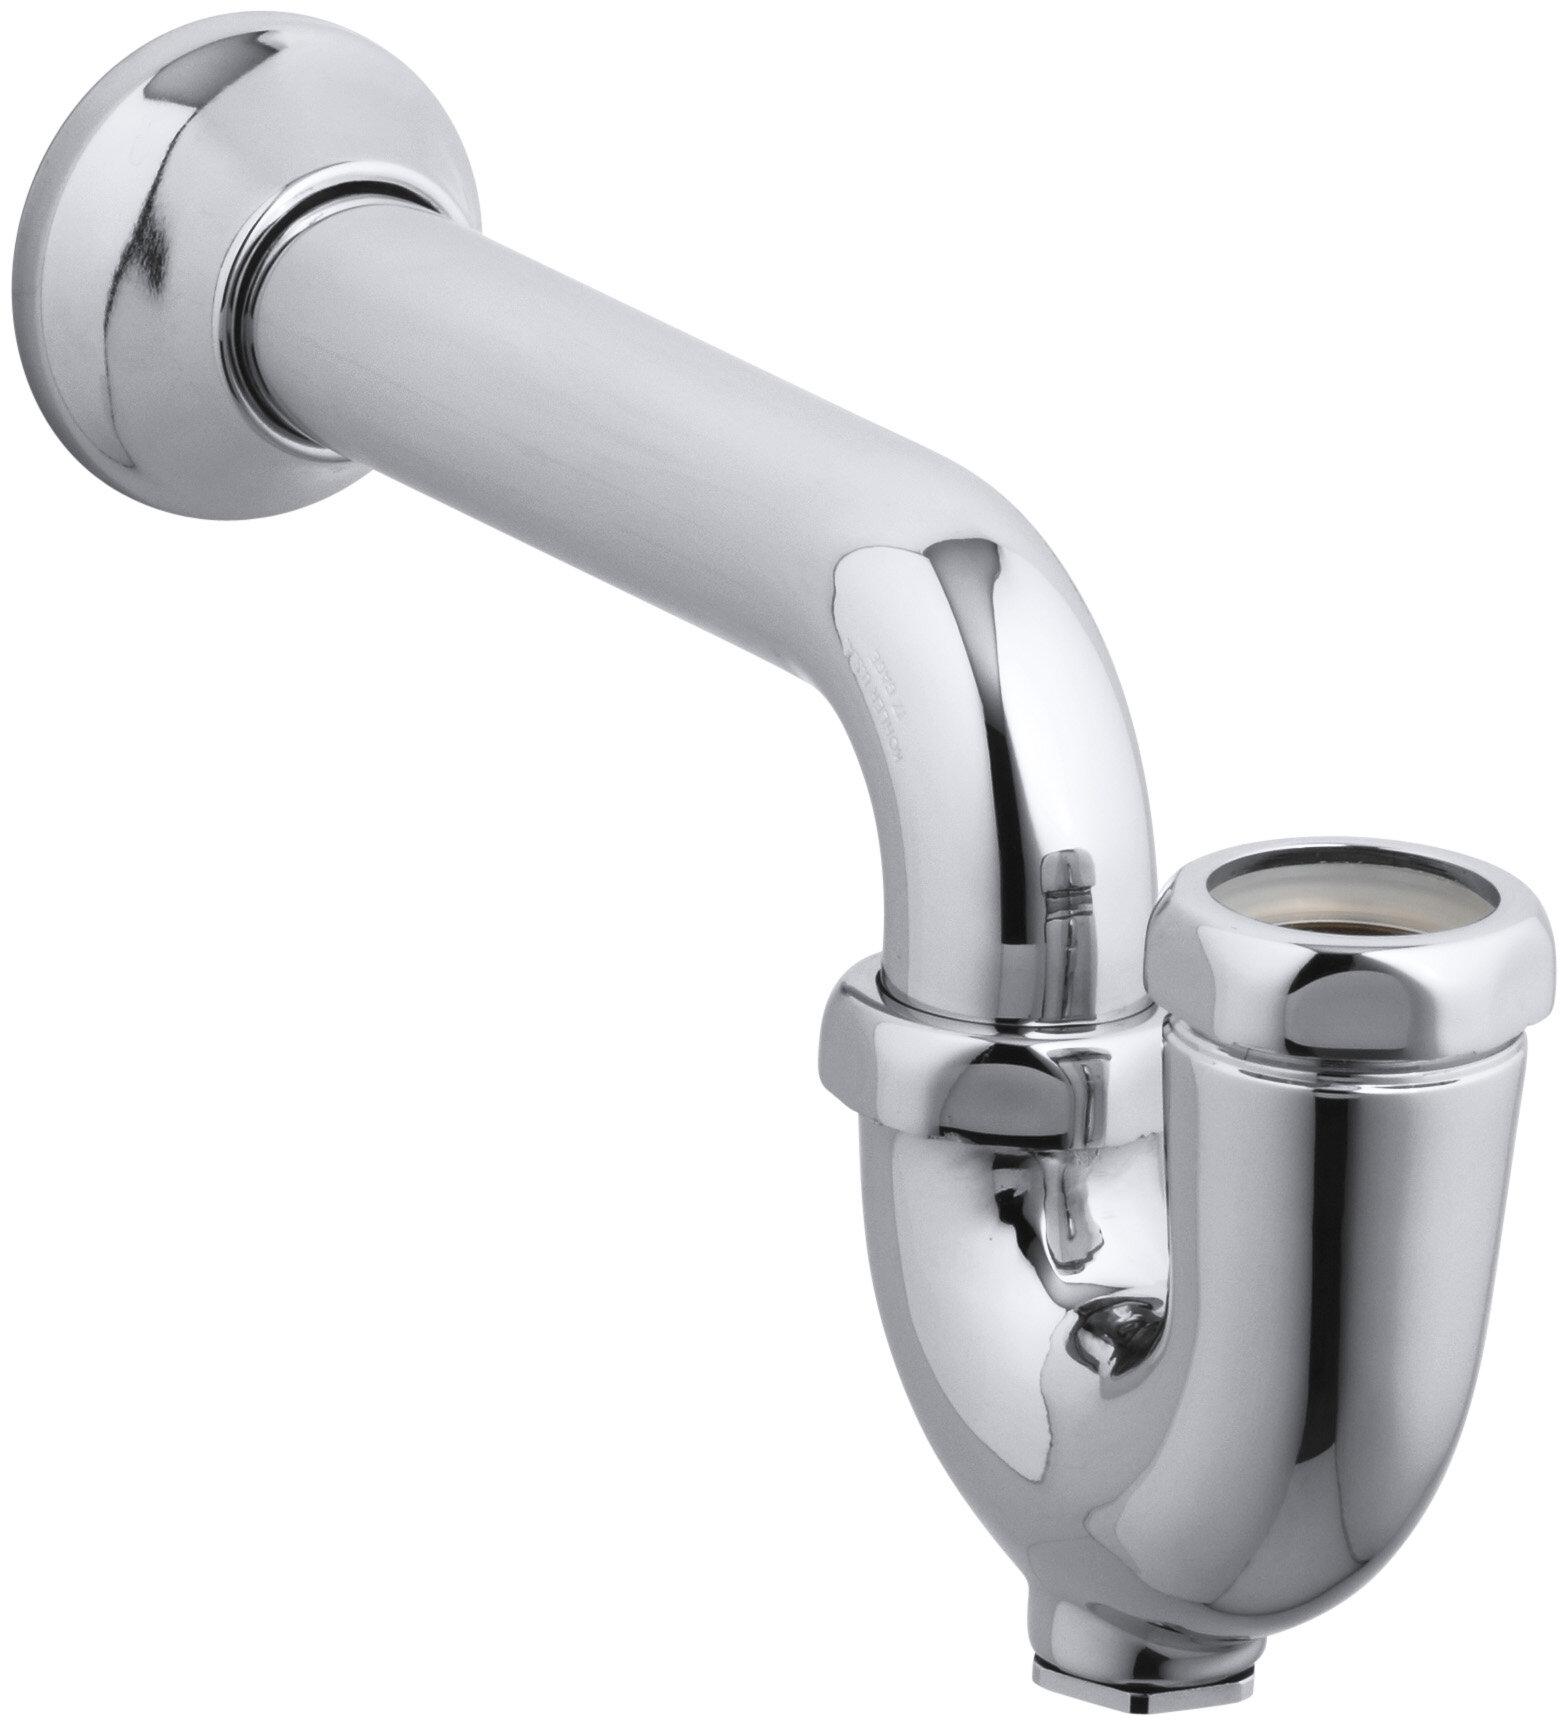 K-9000-CP Kohler Adjustable P-Trap with Tubing Outlet | Wayfair